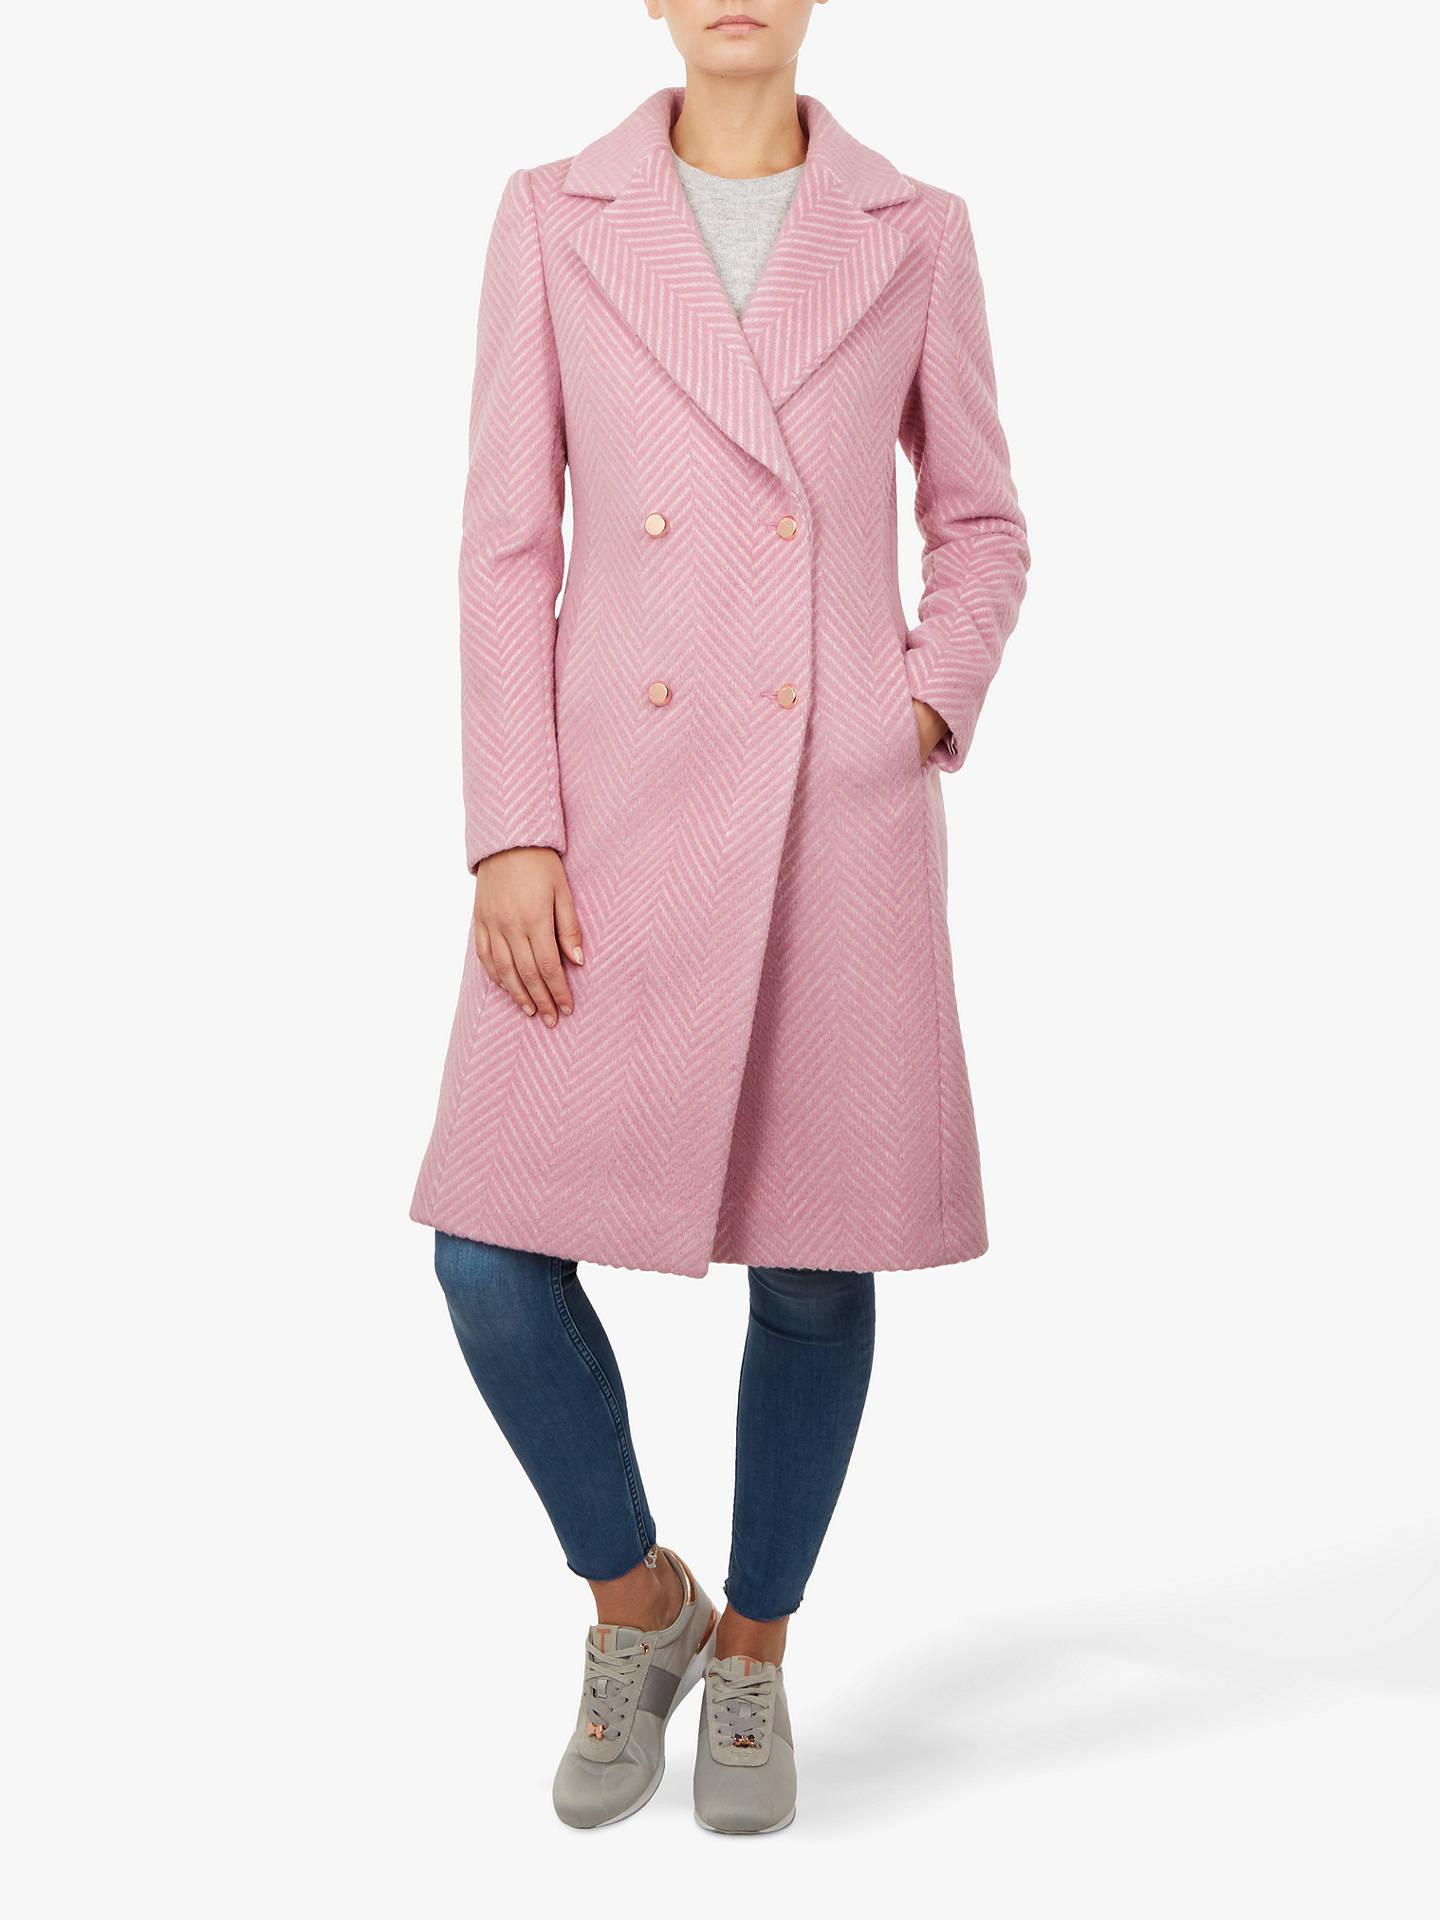 Ted Baker Midi Coat, Light Pink at John